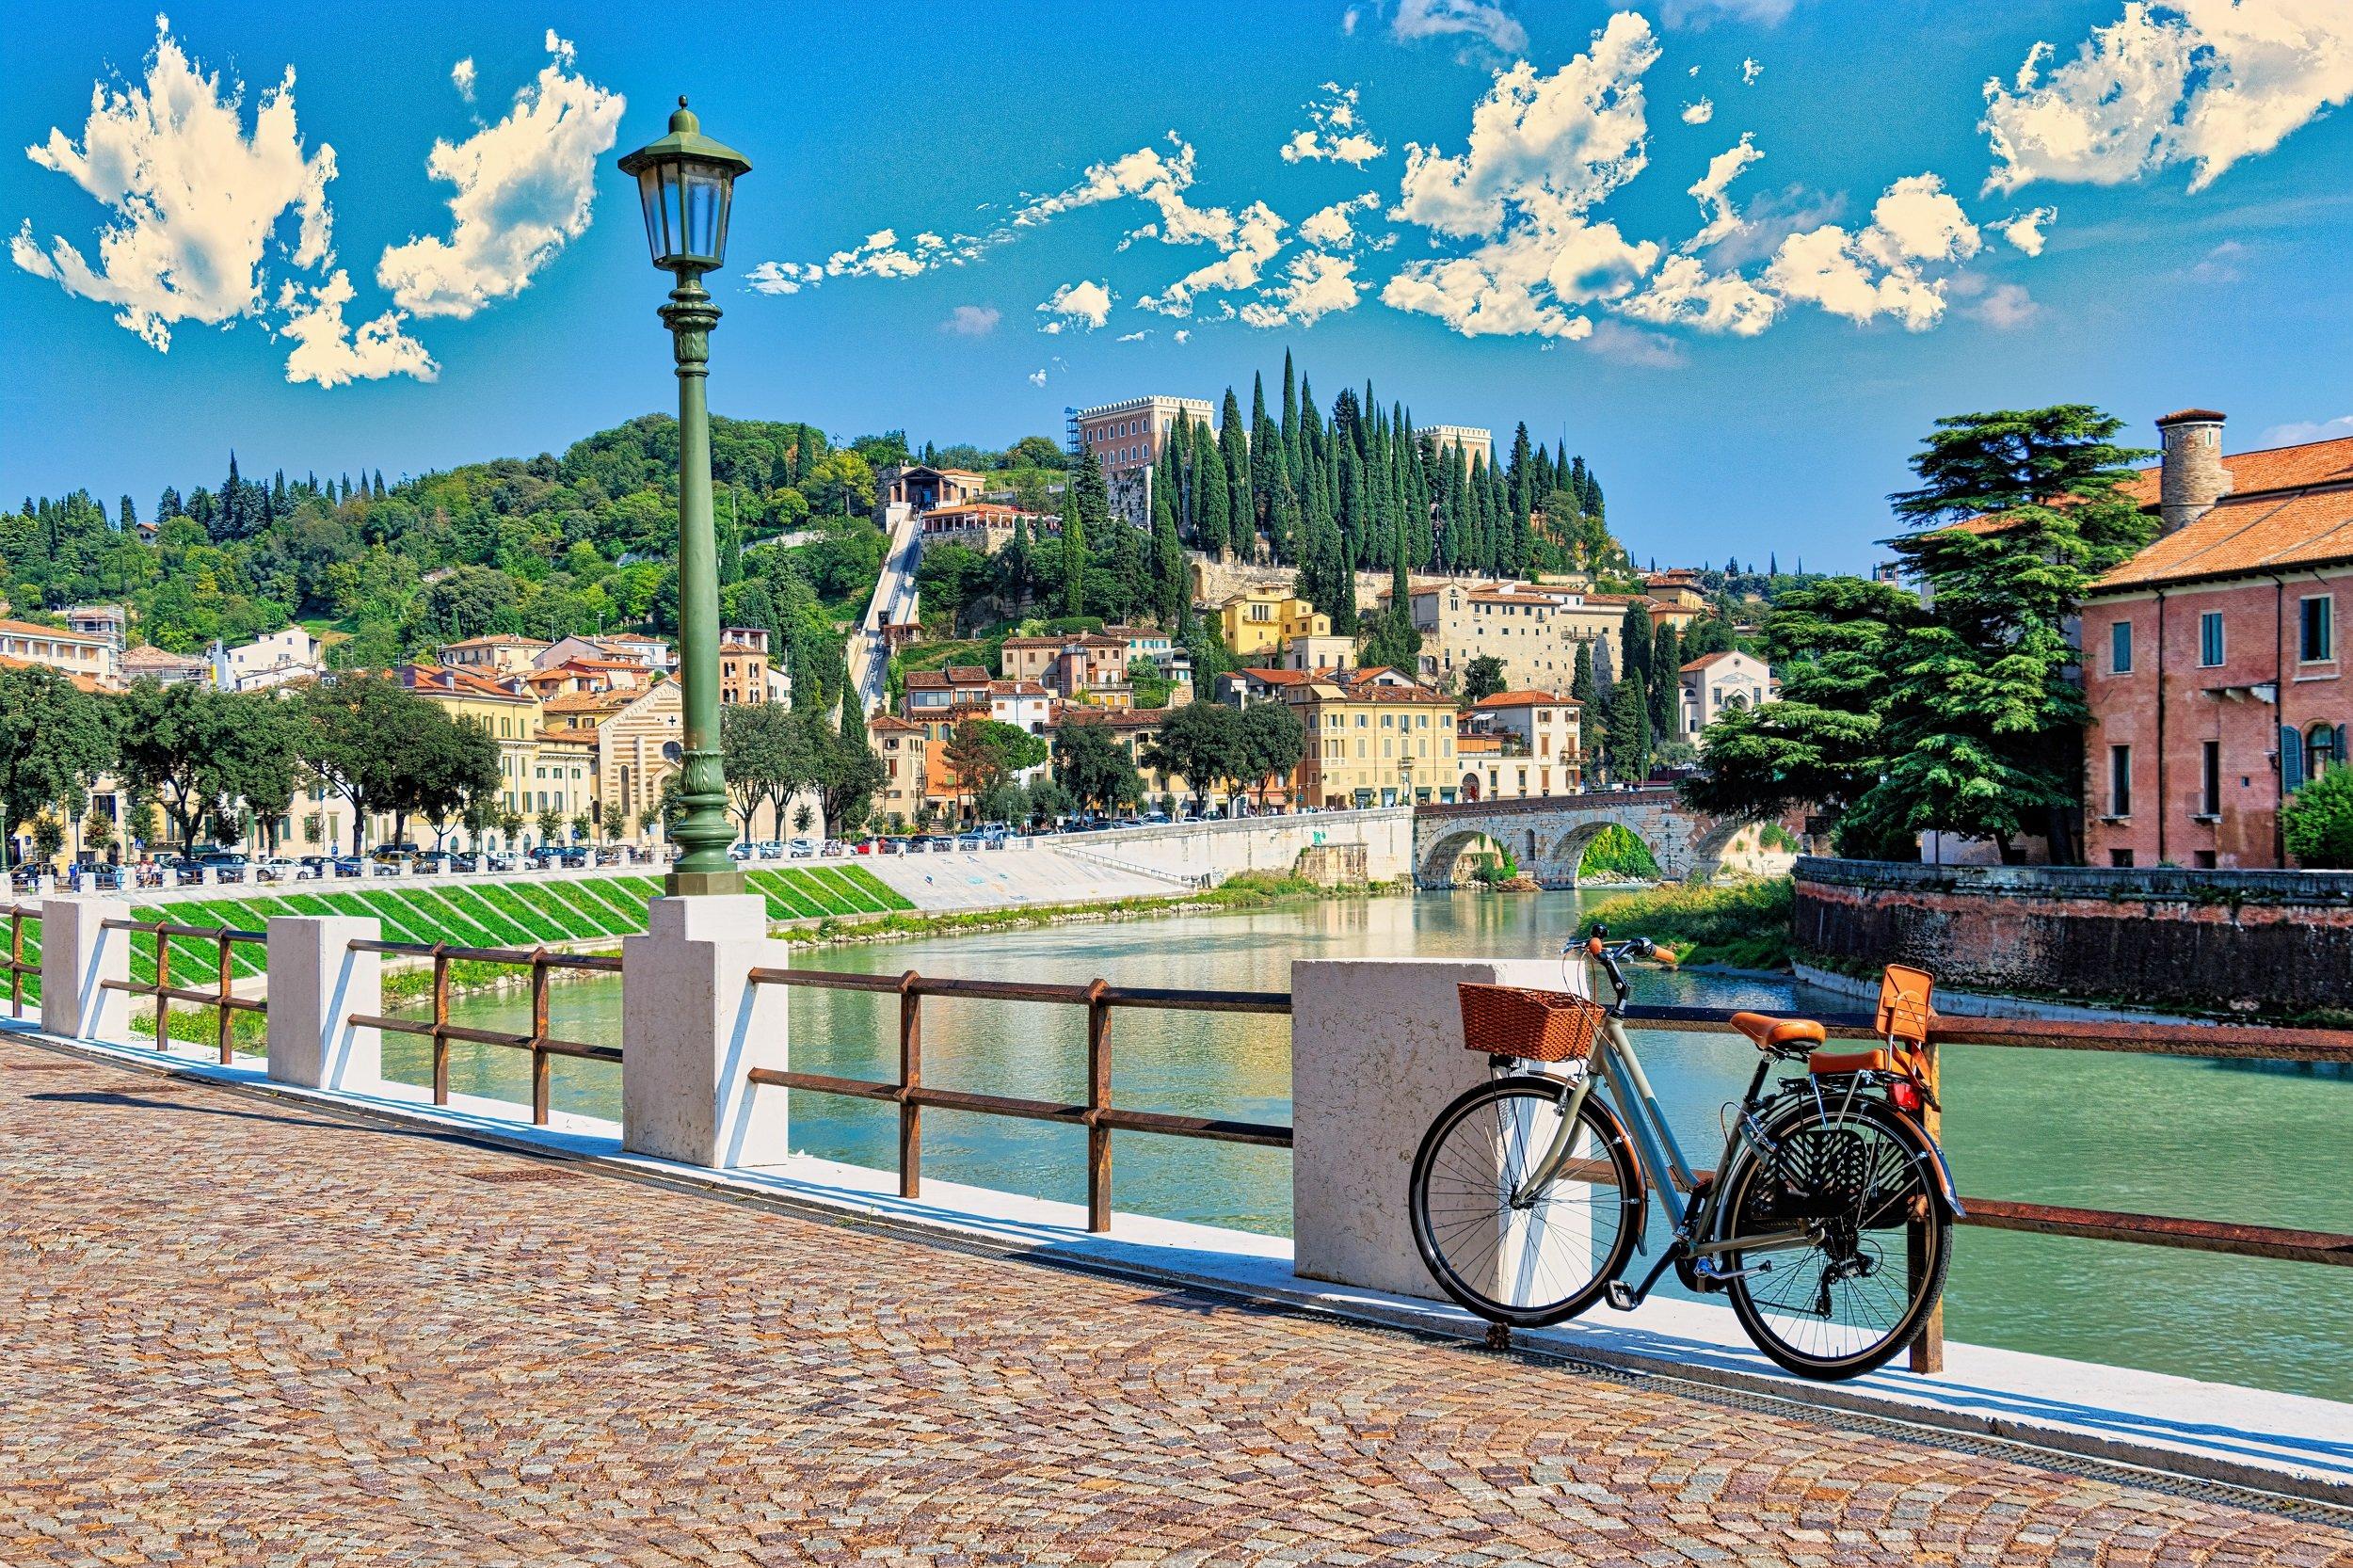 Lake Garda - Venice, Verona, Lake Garda & Countryside 5 Day Tour Package_5